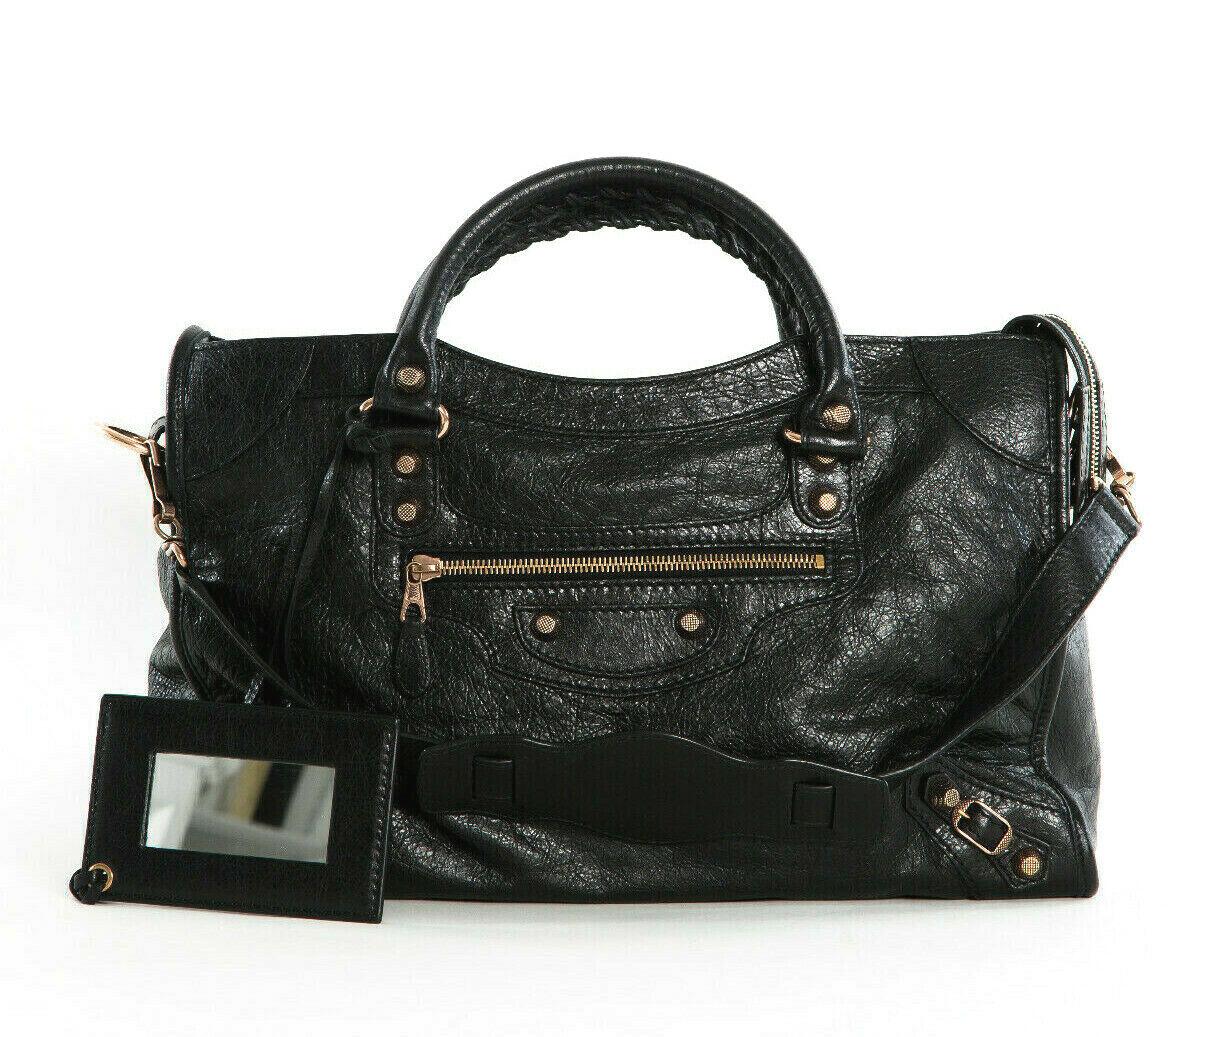 New Balenciaga Giant 12 Black Gold Hardware Agneau Lambskin City Bag 281770